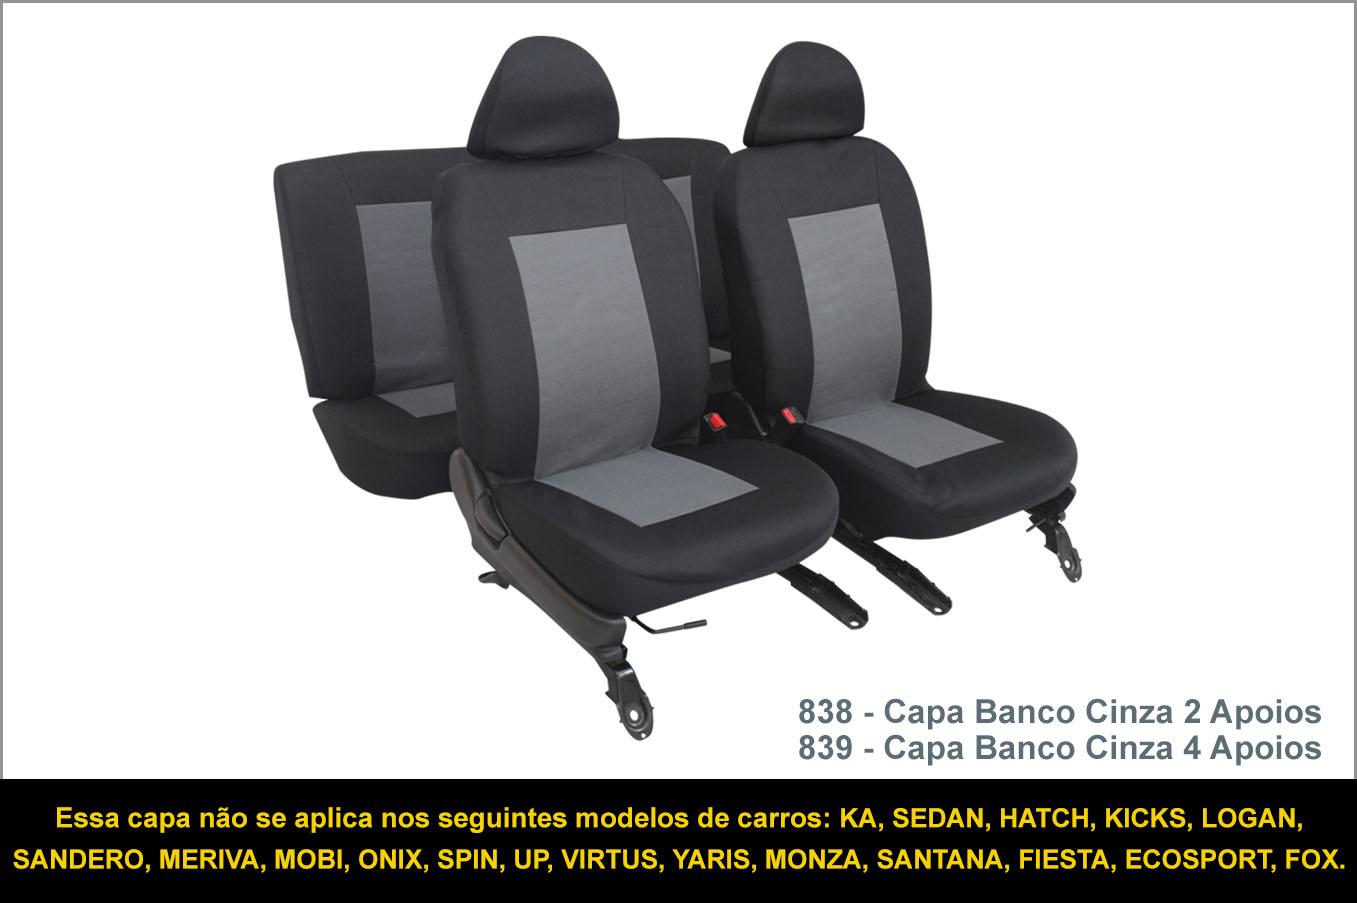 838 839 Capas Cinza - Essa capa não se aplica nos seguintes modelos de carros: KA, SEDAN, HATCH, KICKS, LOGAN, SANDERO, MERIVA, MOBI, ONIX, SPIN, UP, VIRTUS, YARIS, MONZA, SANTANA, FIESTA, ECOSPORT, FOX.